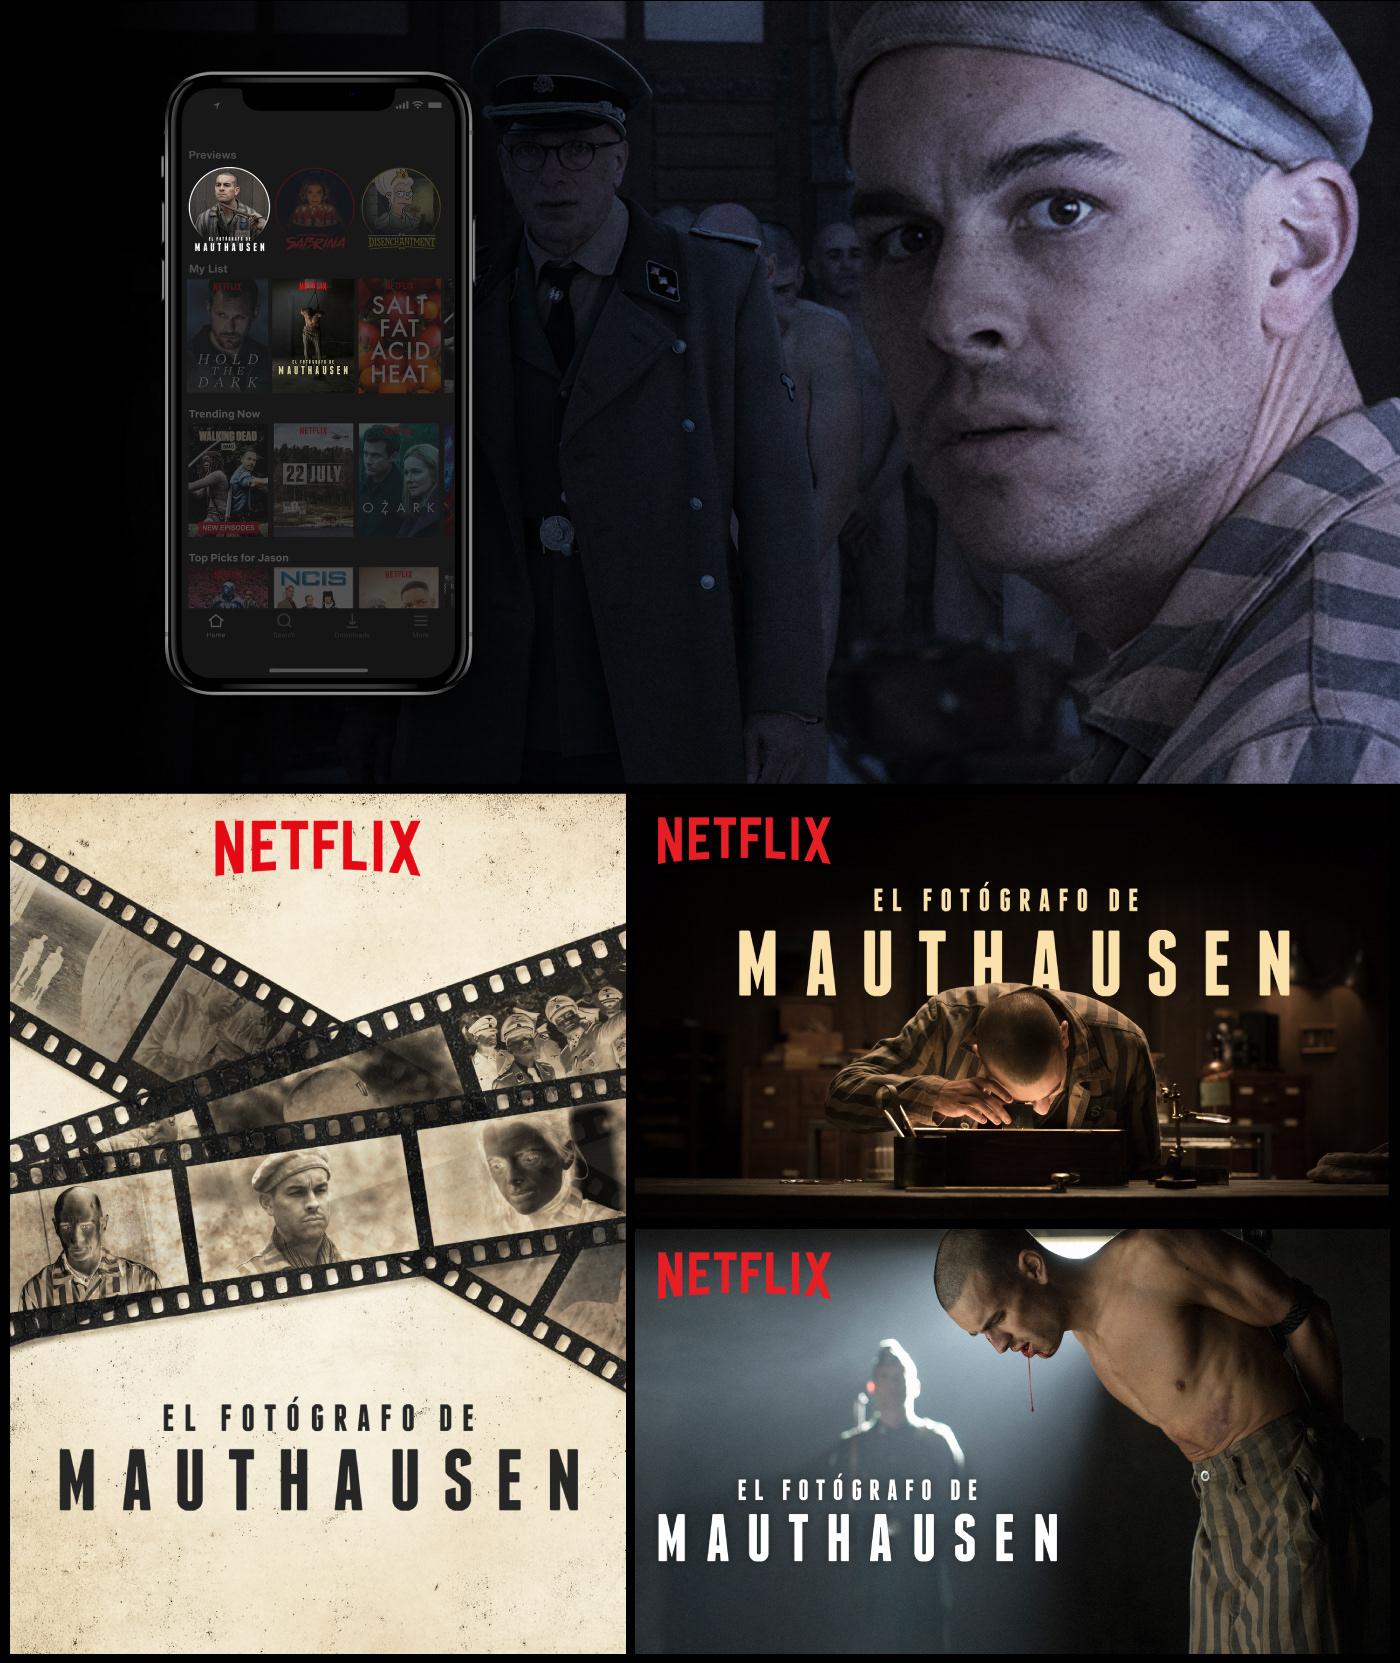 nazi austria escape tv broadcast Responsive mobile War VOD Weapon